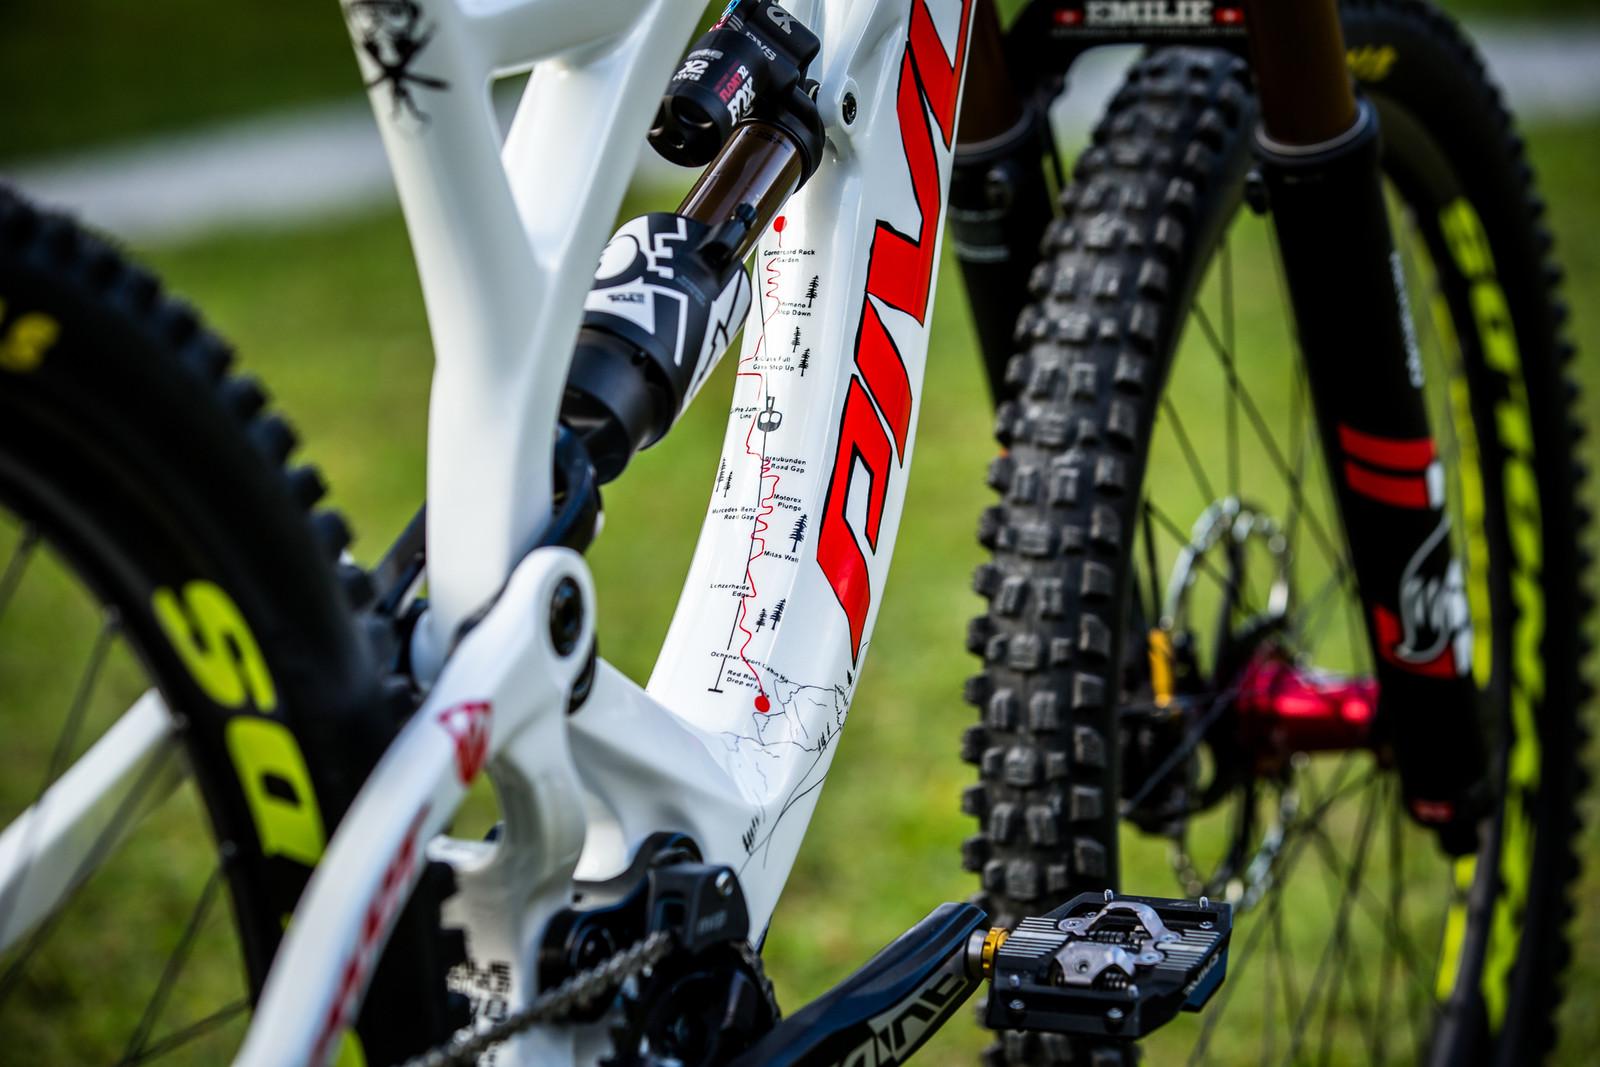 Cheat Sheet - WORLD CHAMPS BIKE - Emilie Siegenthaler's Pivot Phoenix - Mountain Biking Pictures - Vital MTB